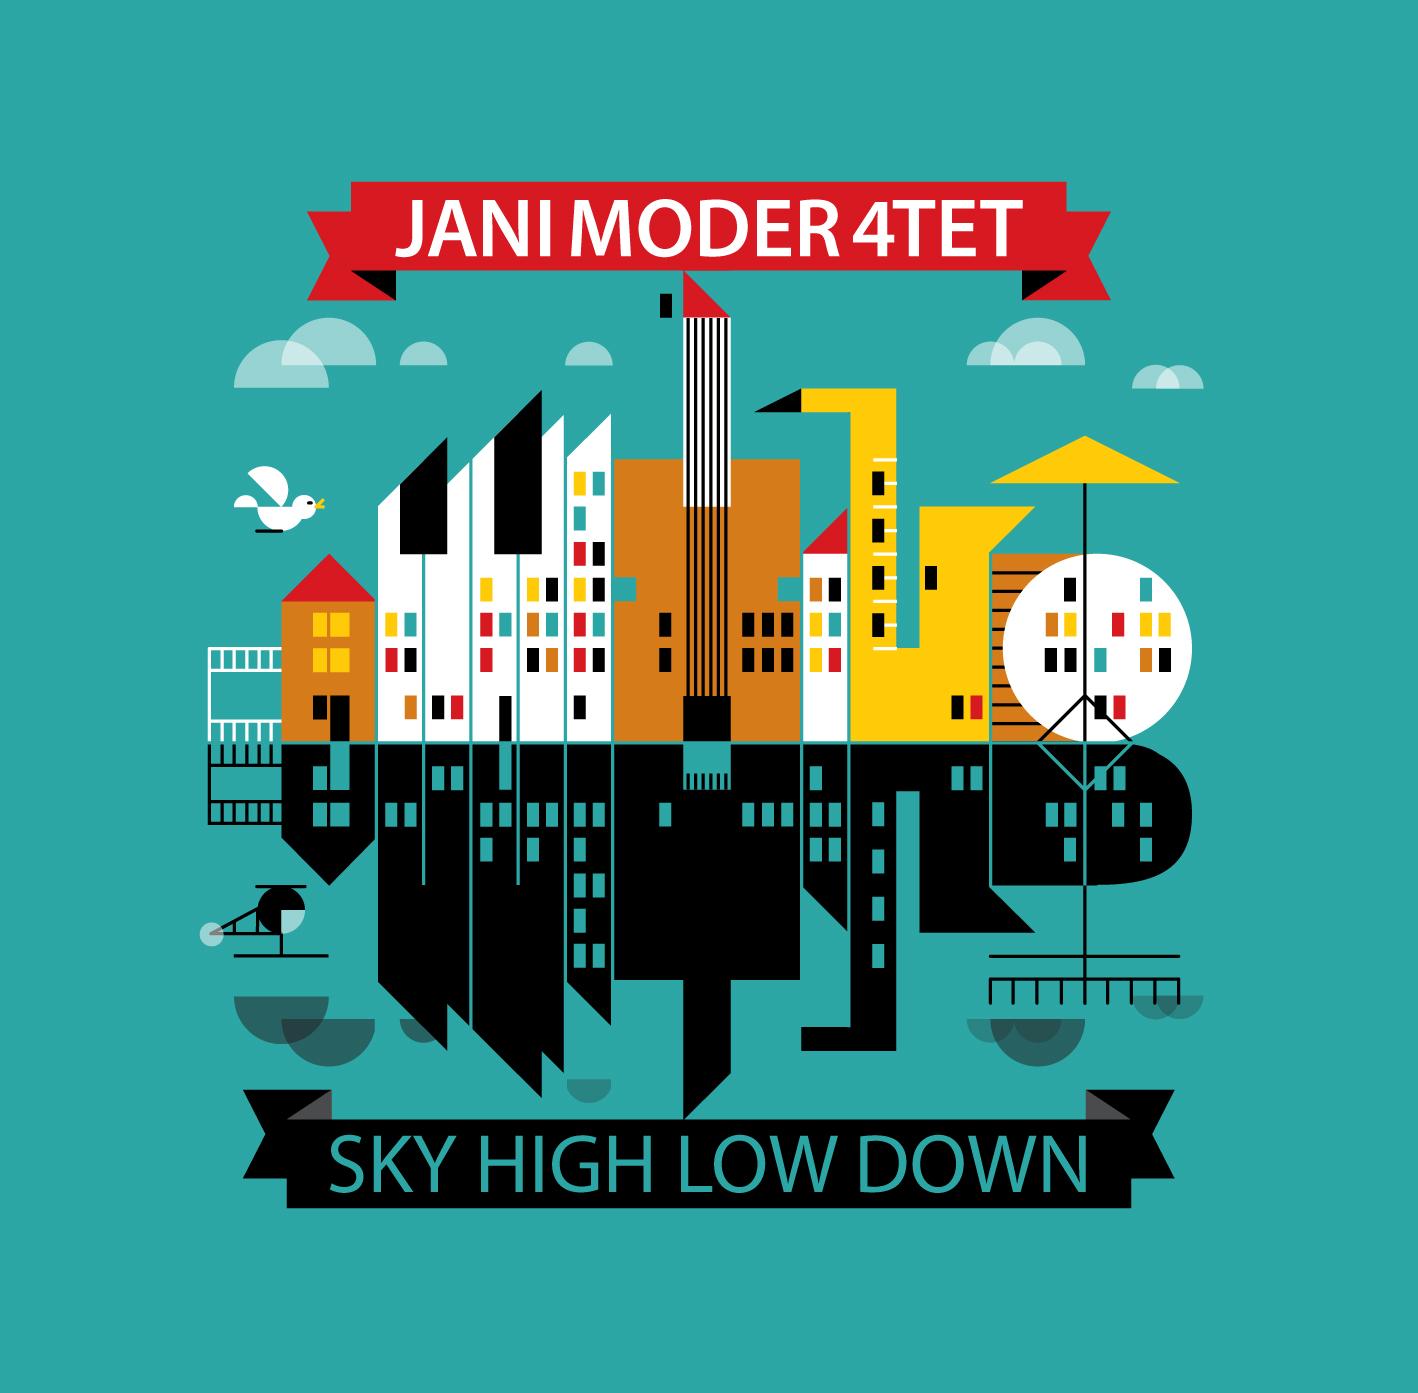 sky-high-low-down